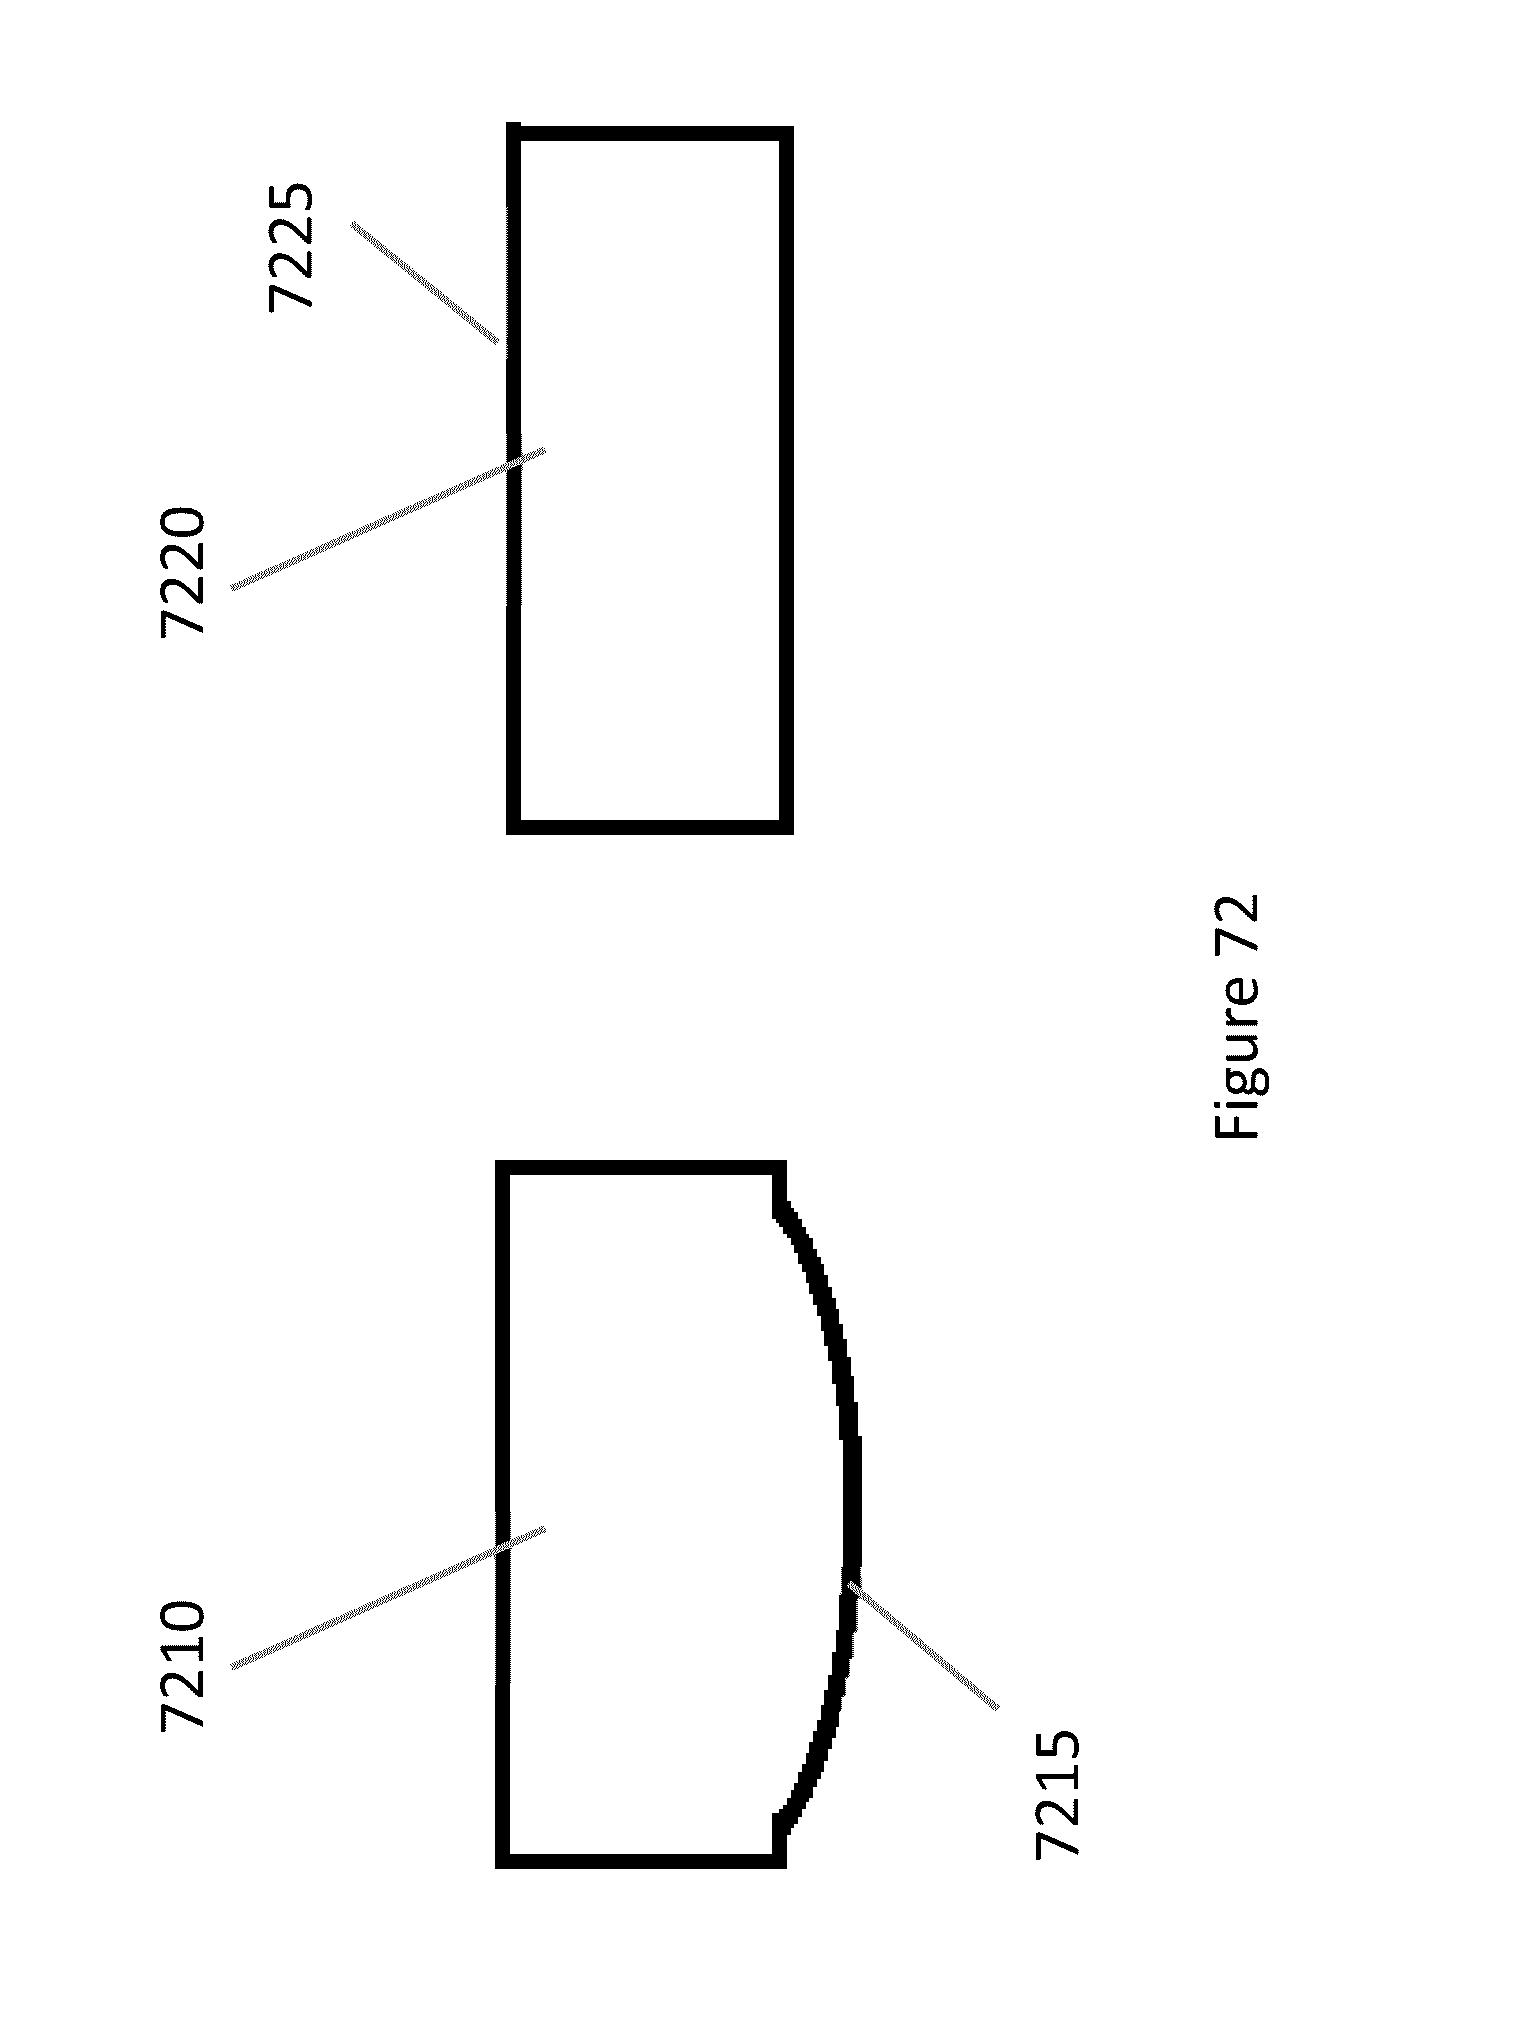 Patent US 9,658,457 B2